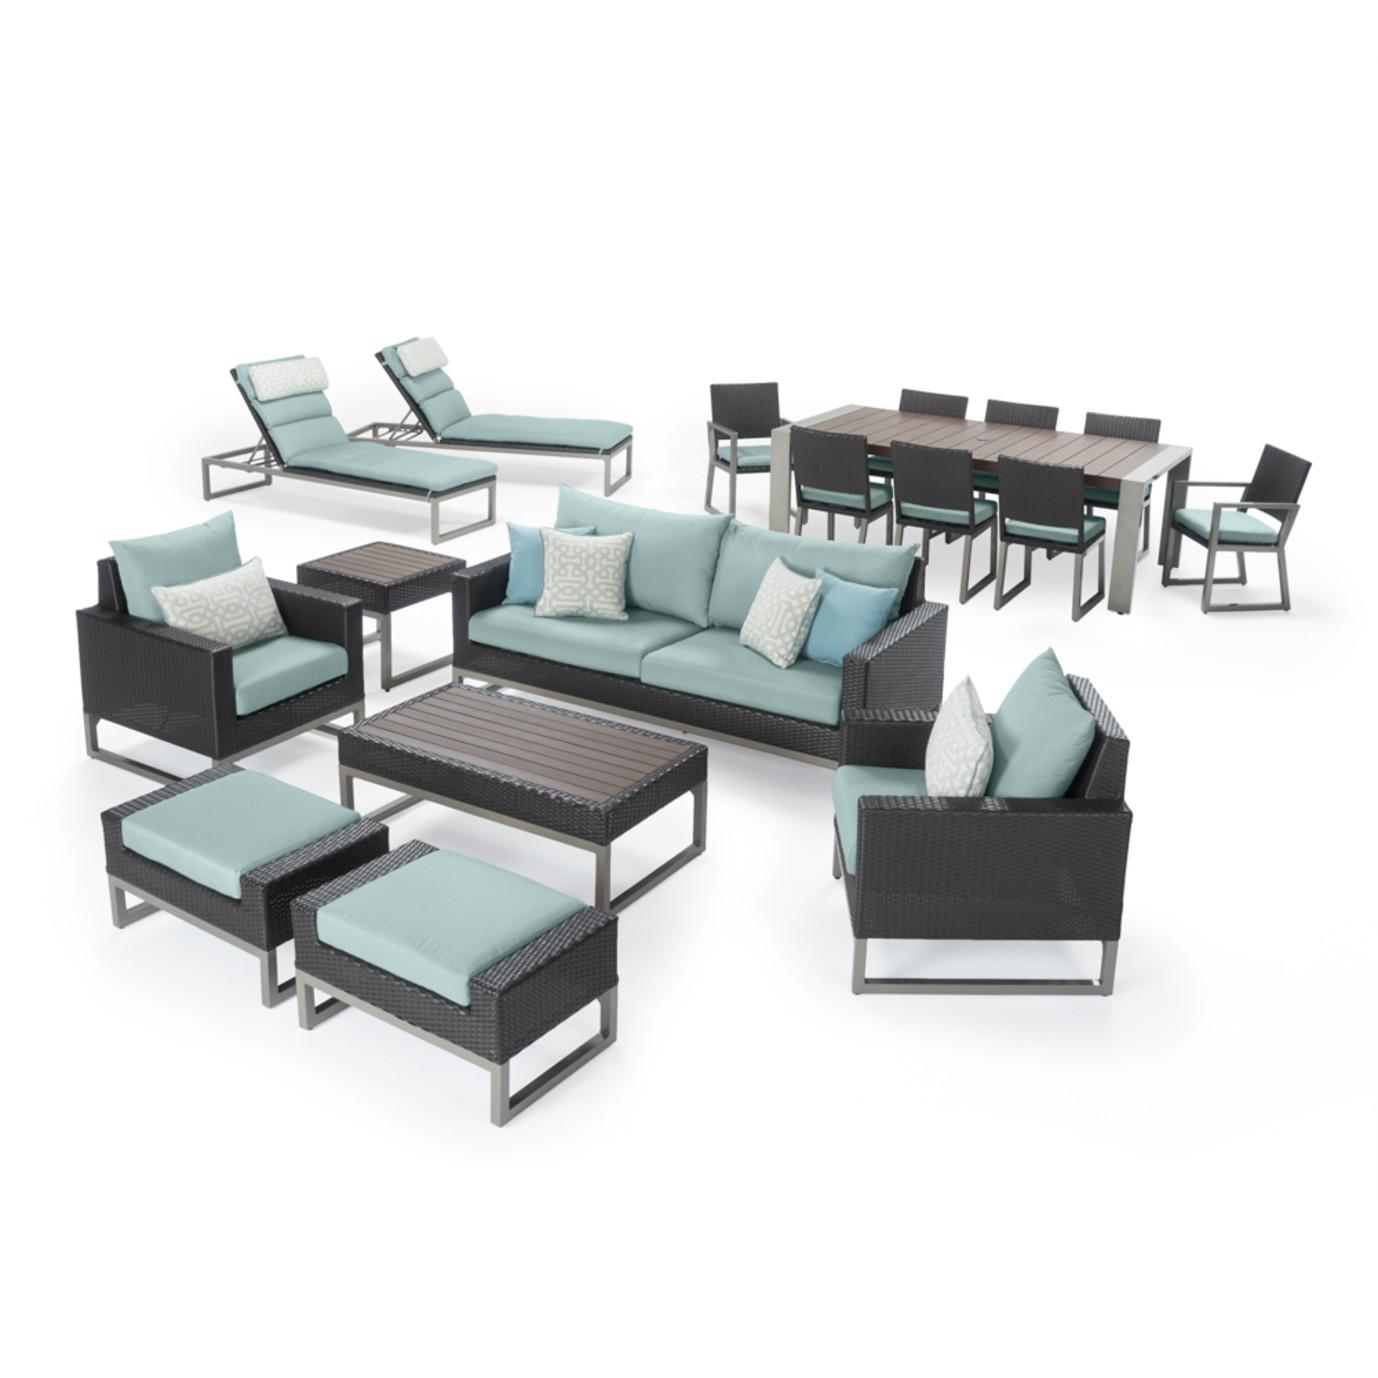 Milo™ Espresso 18pc Estate Set - Spa Blue